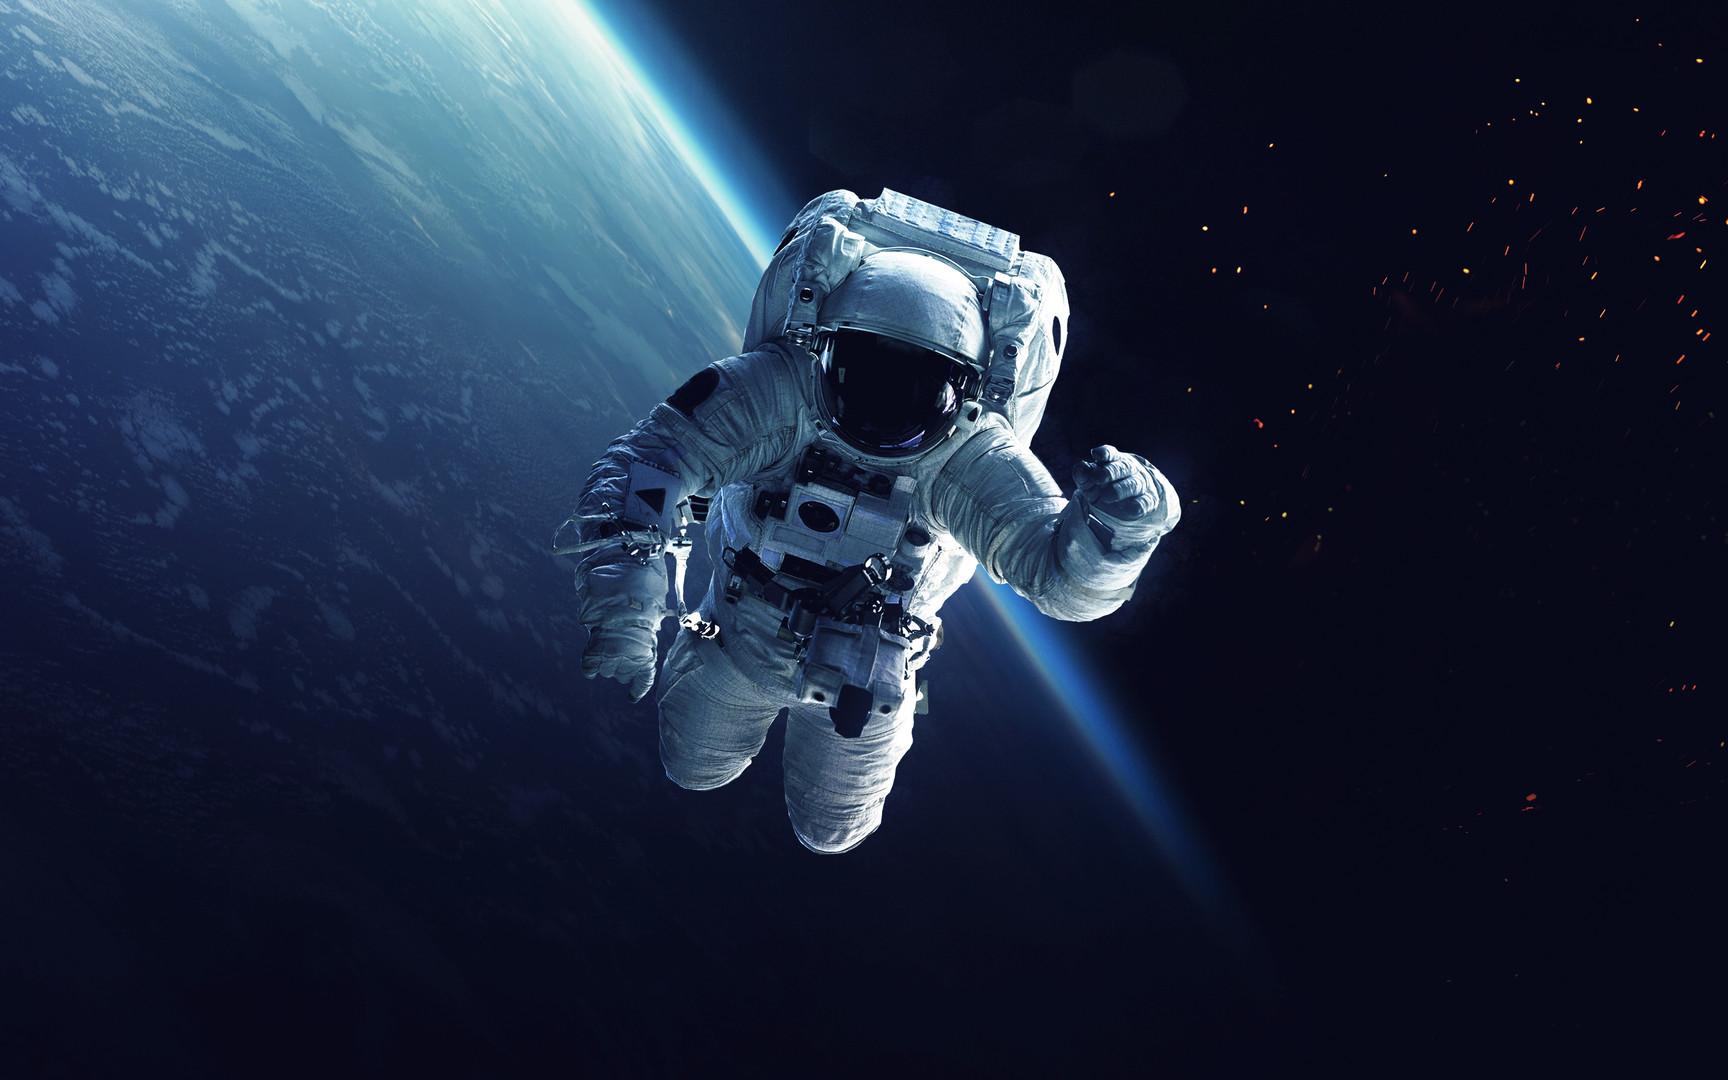 Astronaut at spacewalk. Cosmic art, scie